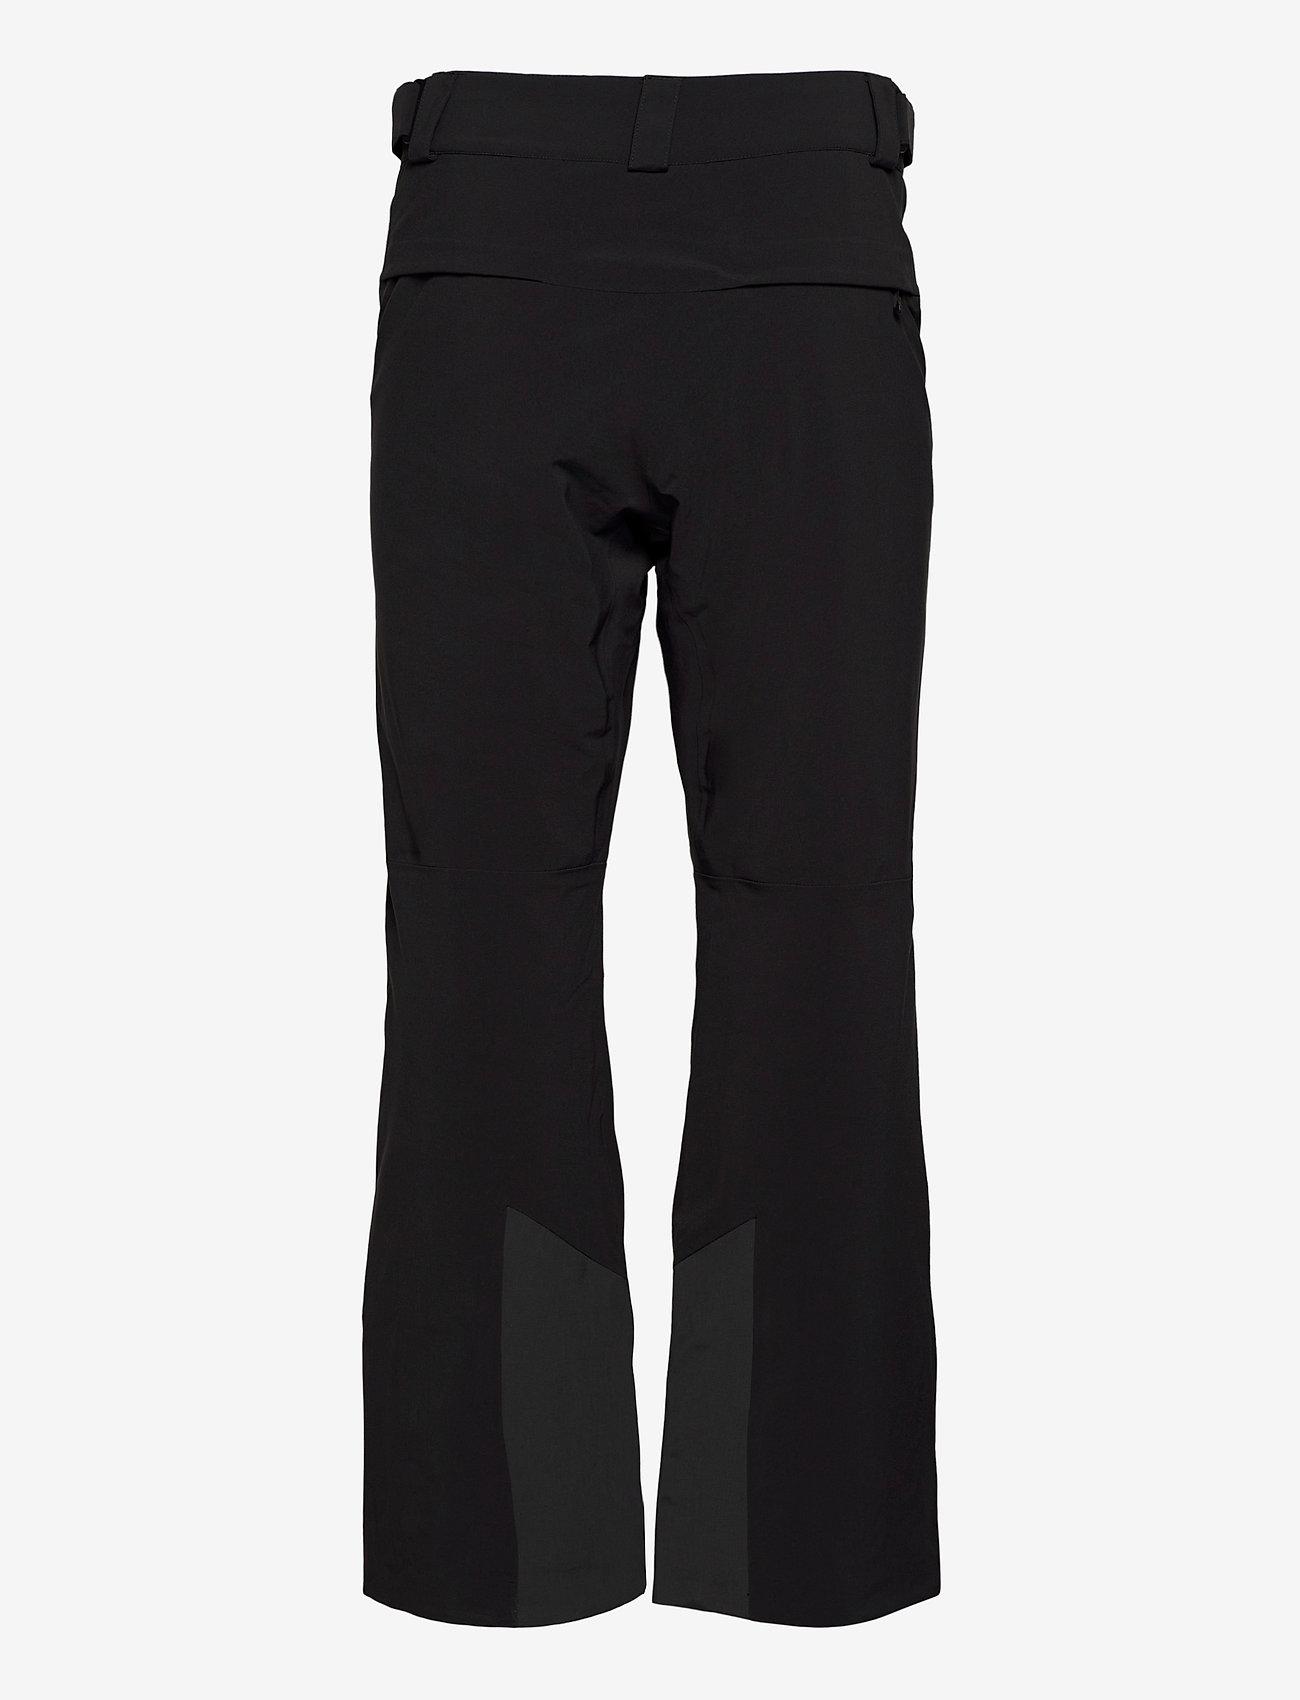 Rapid Pant (Black) (275 €) - Helly Hansen r8bCq